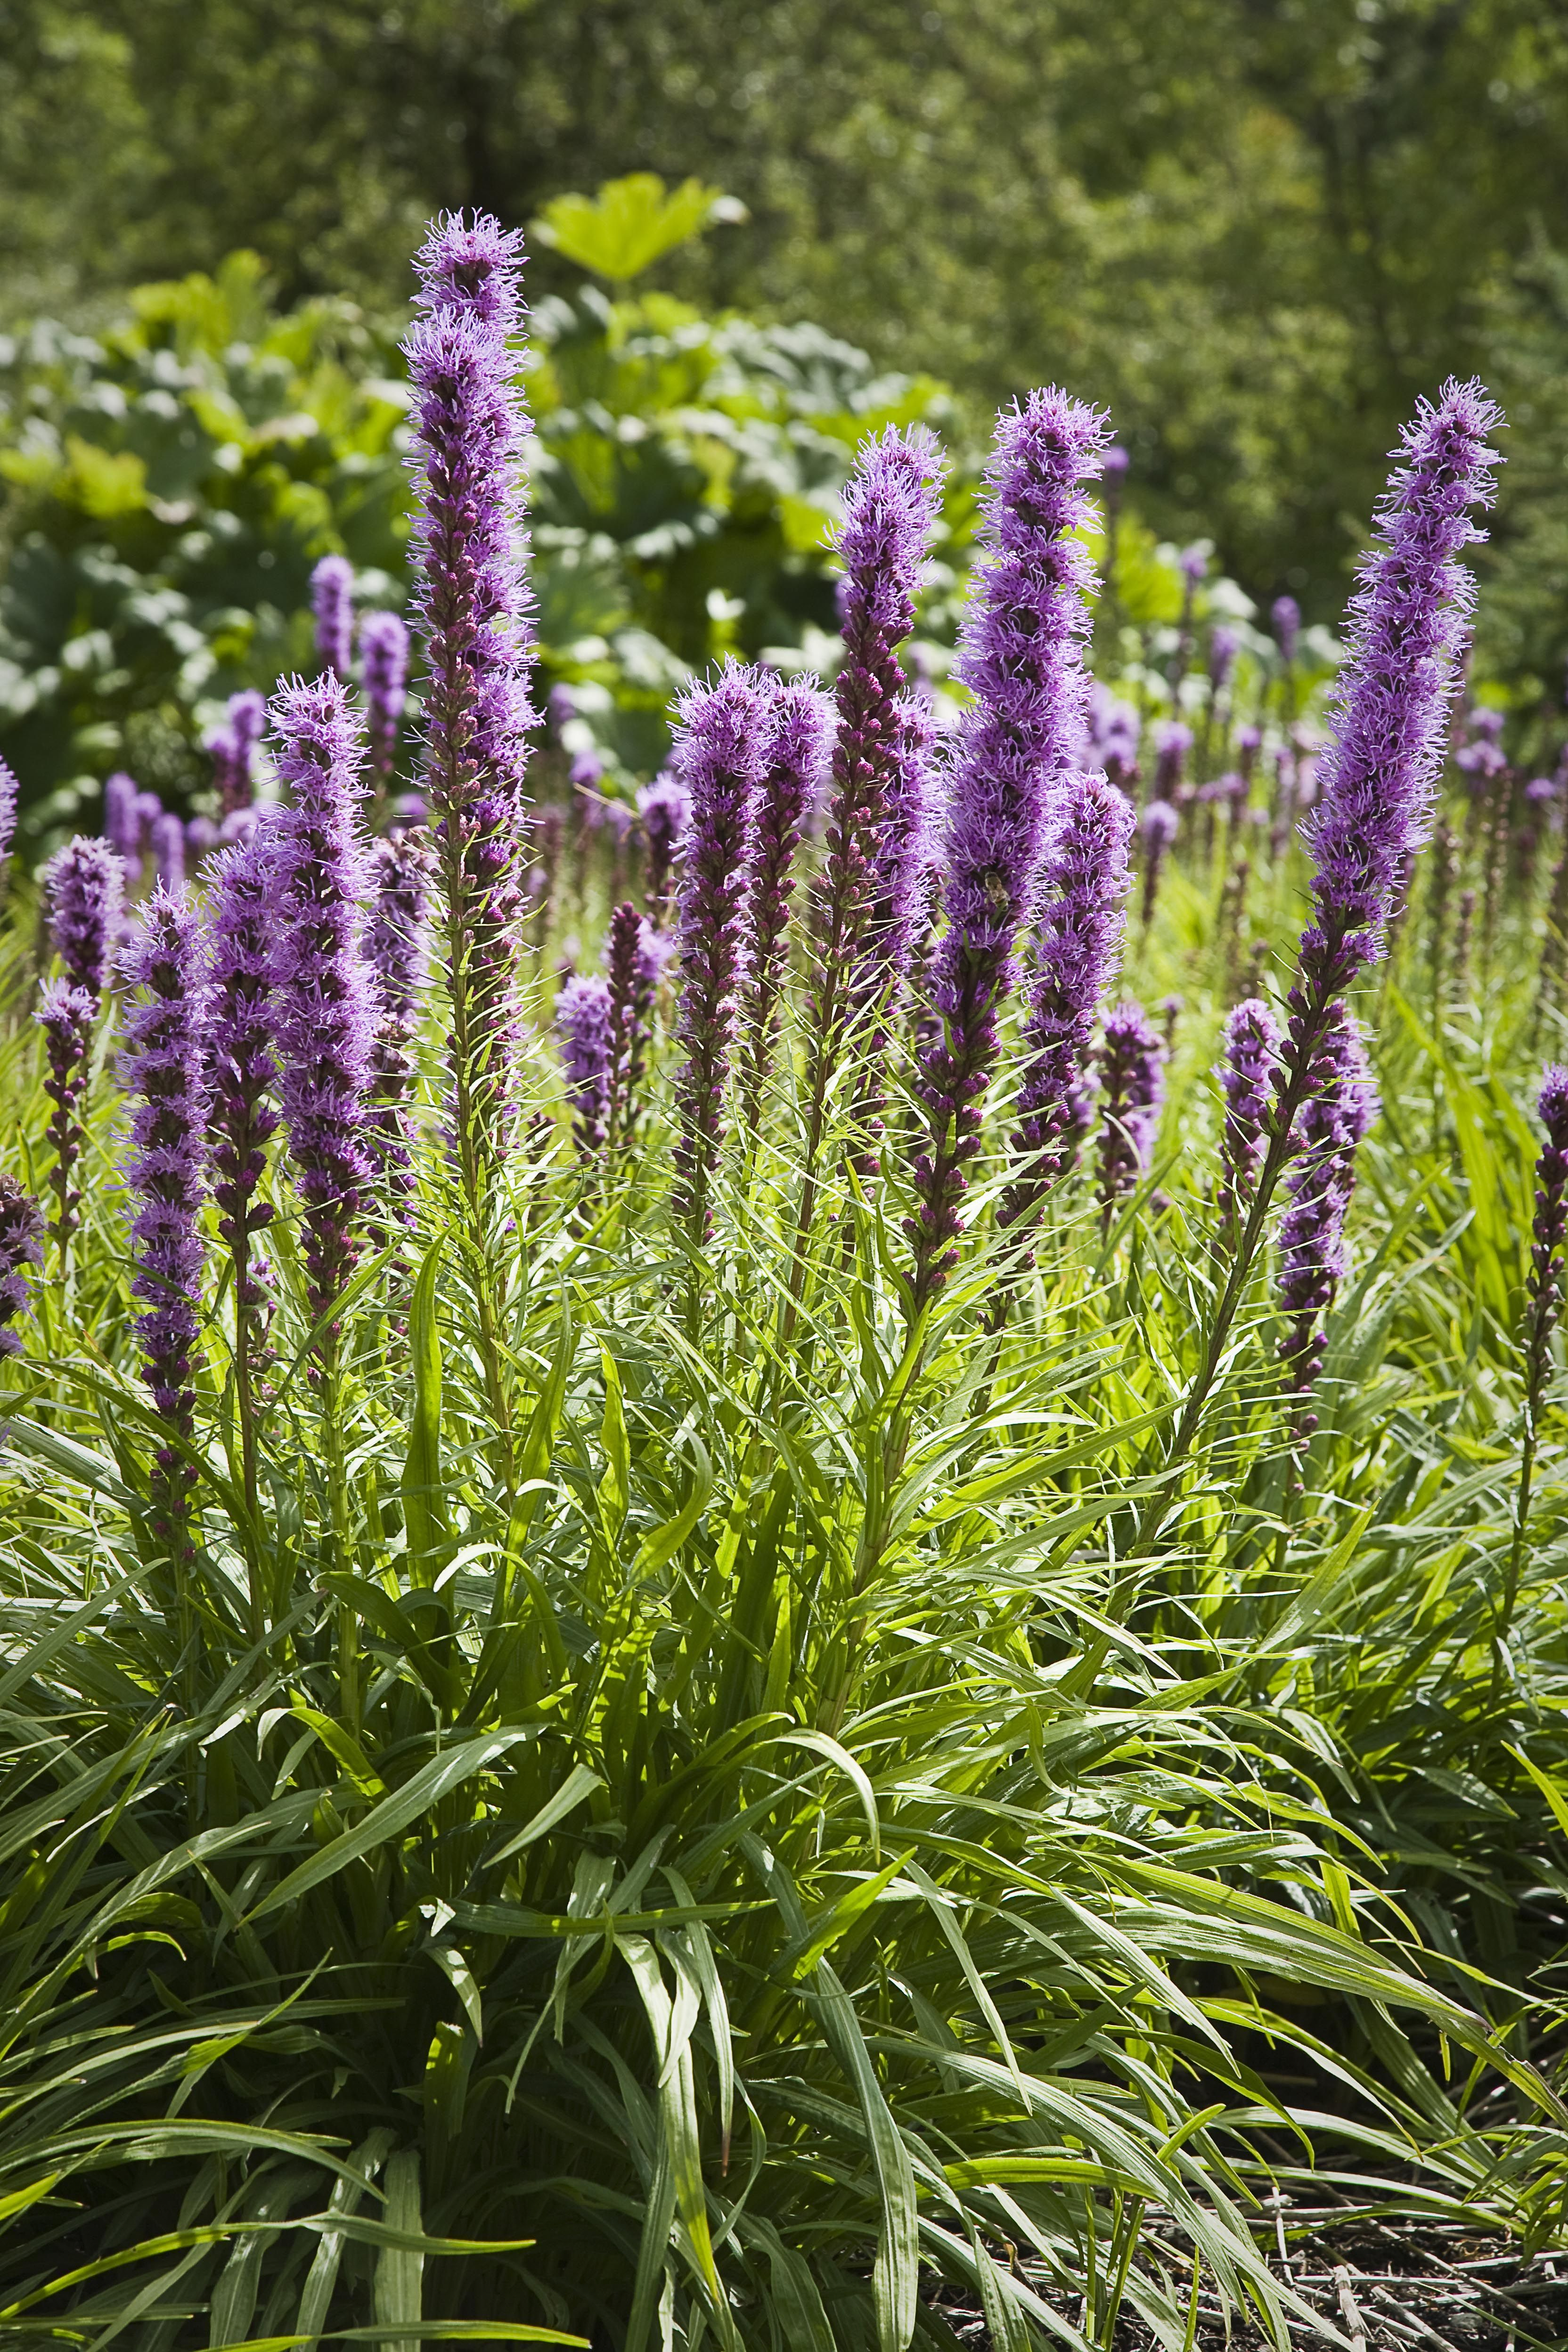 10 Best Full Sun Plants Heat Tolerant Flowers That Love The Sun